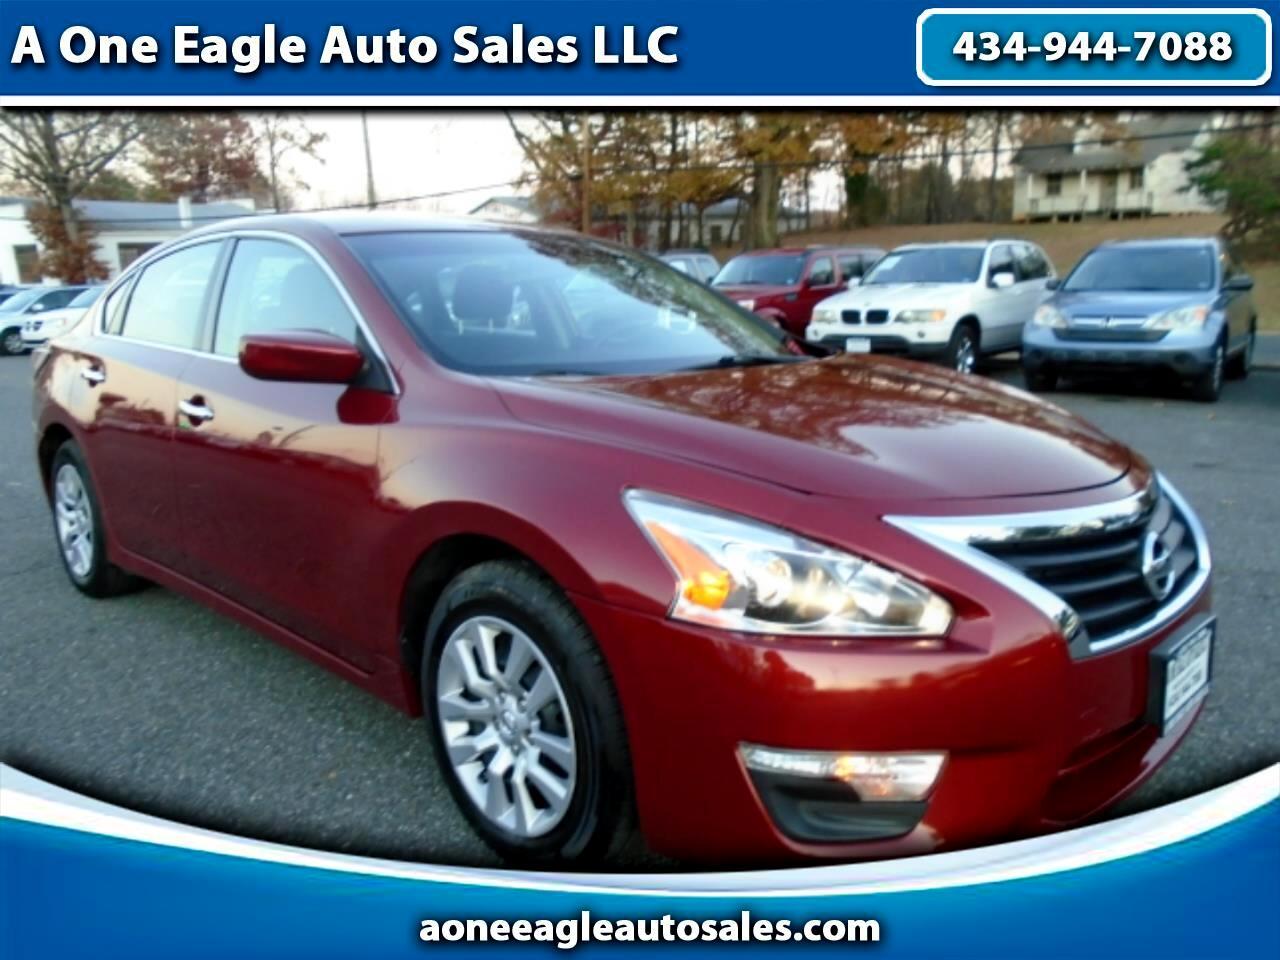 Eagle Auto Sales >> Used Cars For Sale Lynchburg Va 24572 A One Eagle Auto Sales Llc